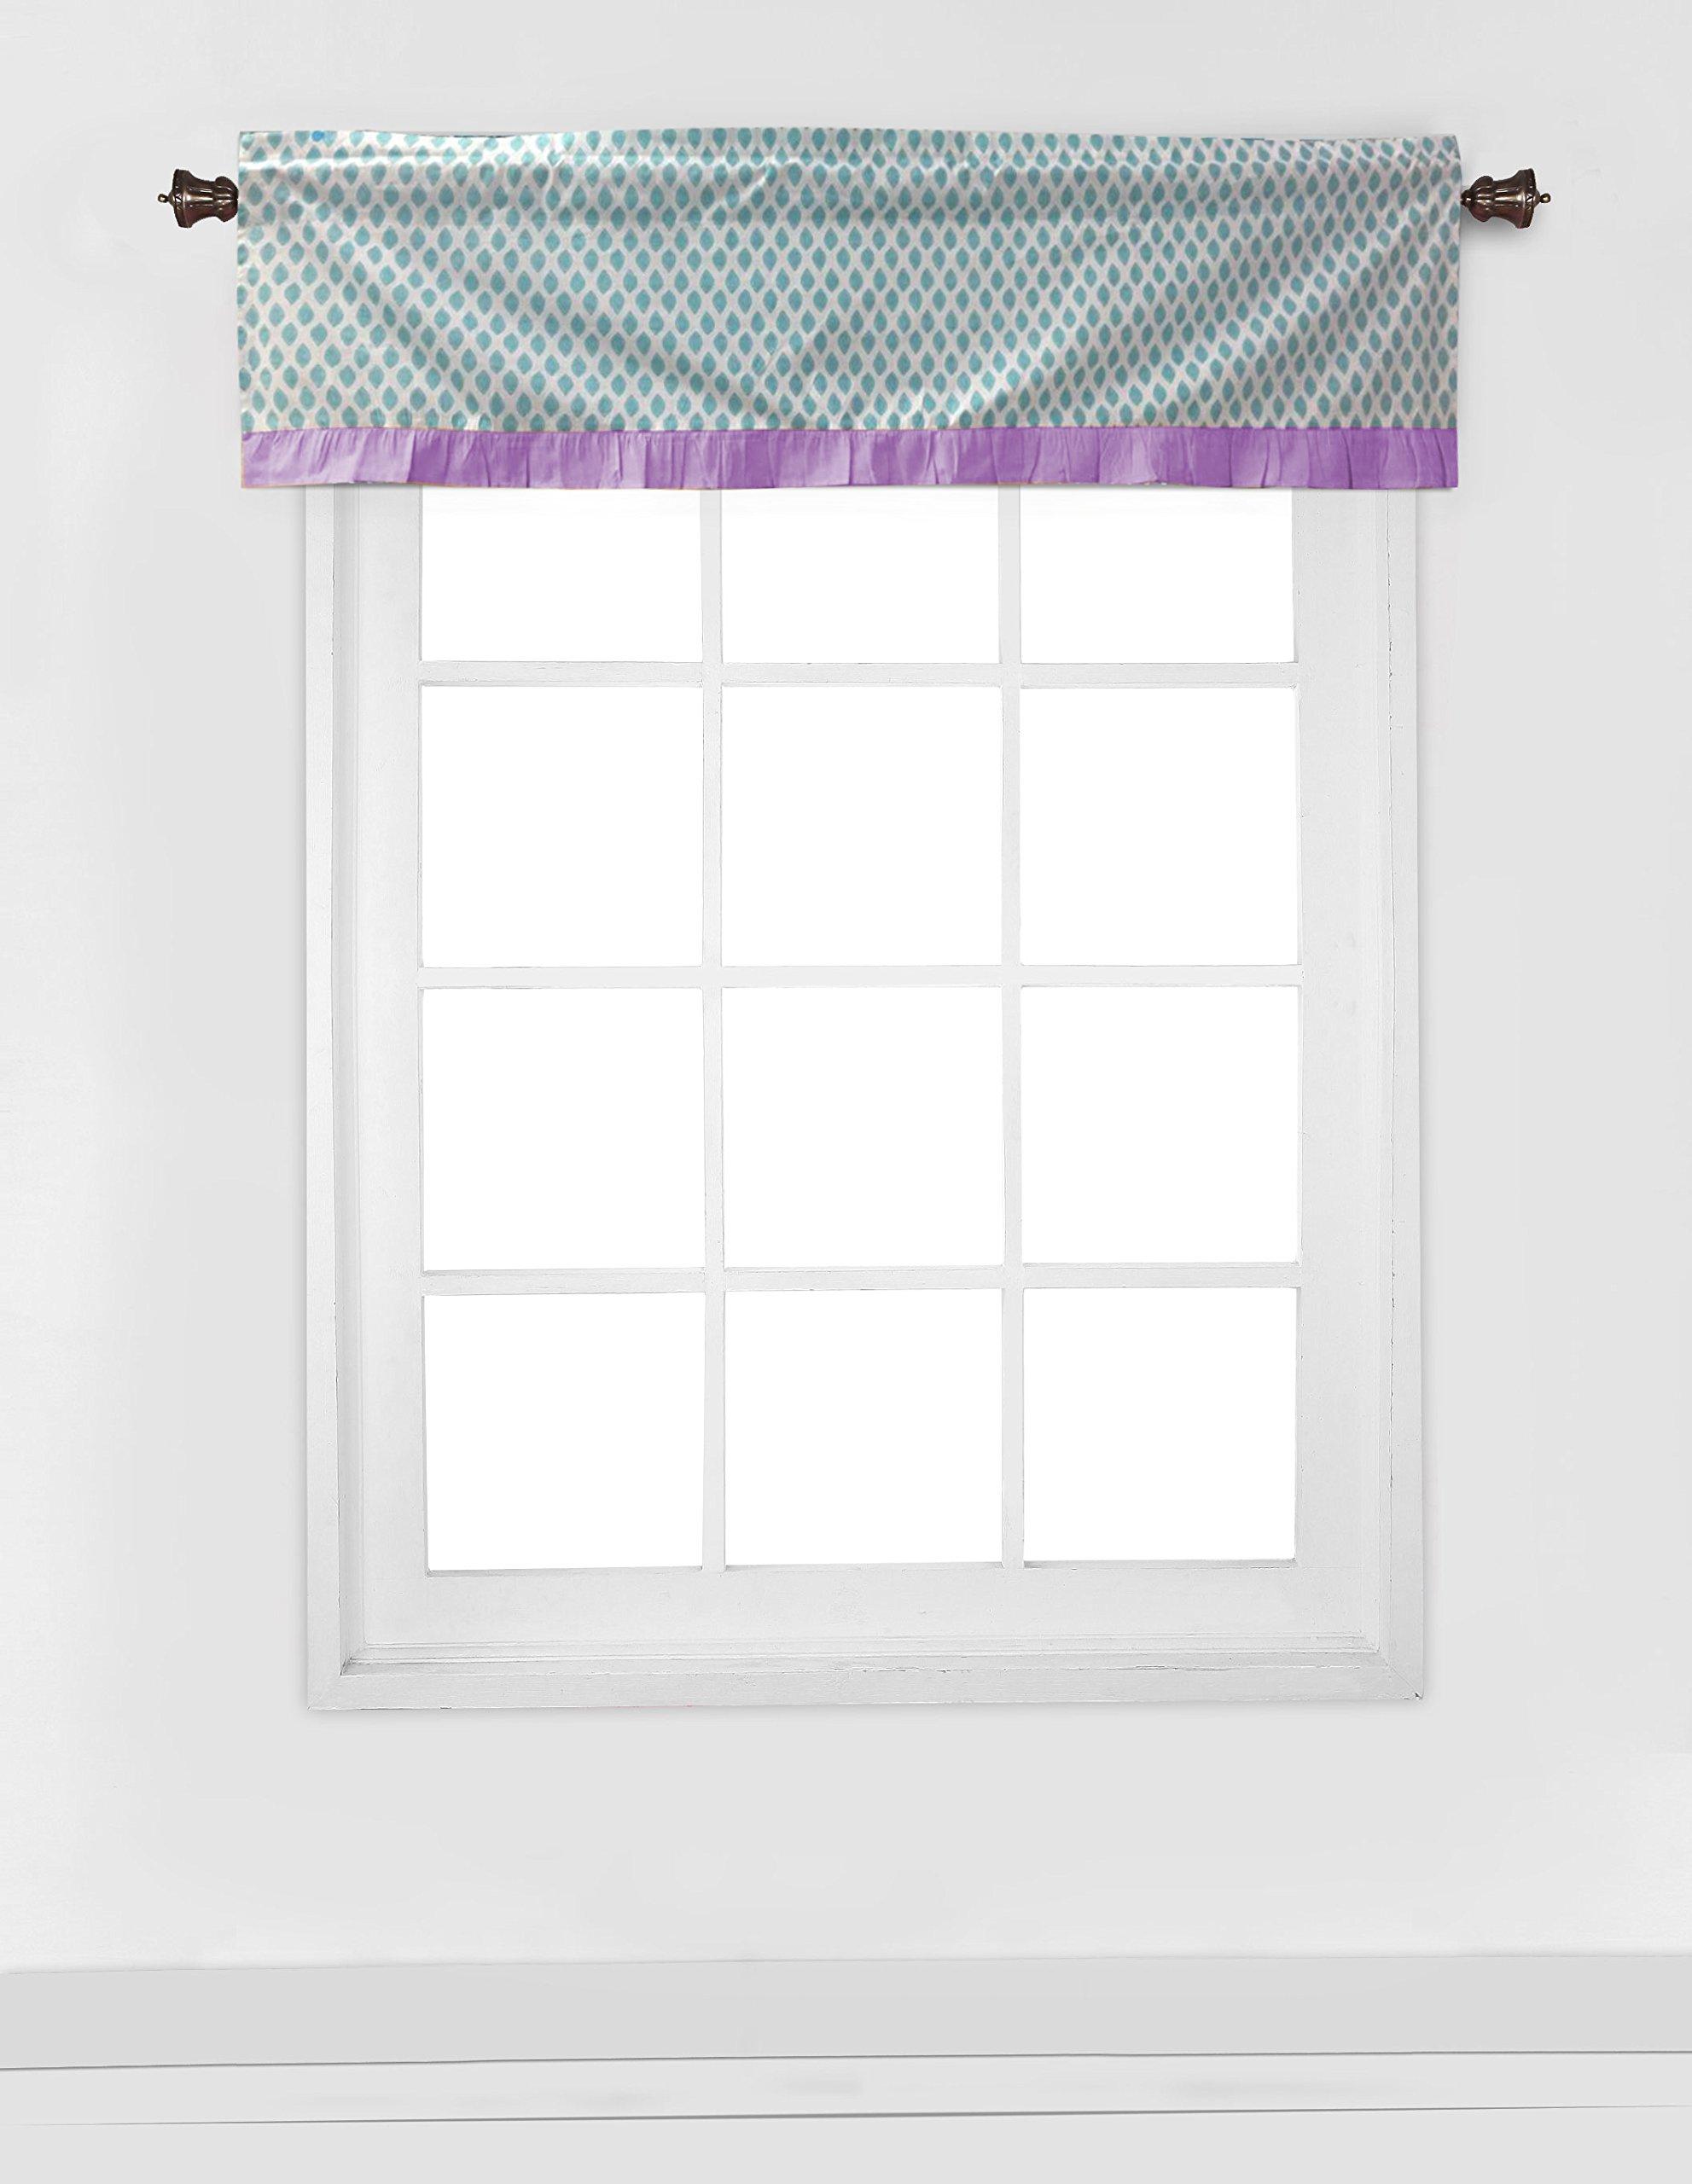 Bacati Isabella Girls Paisley 6 Piece Crib Set with Diaper Stacker, Lilac/Purple/Aqua by Bacati (Image #4)